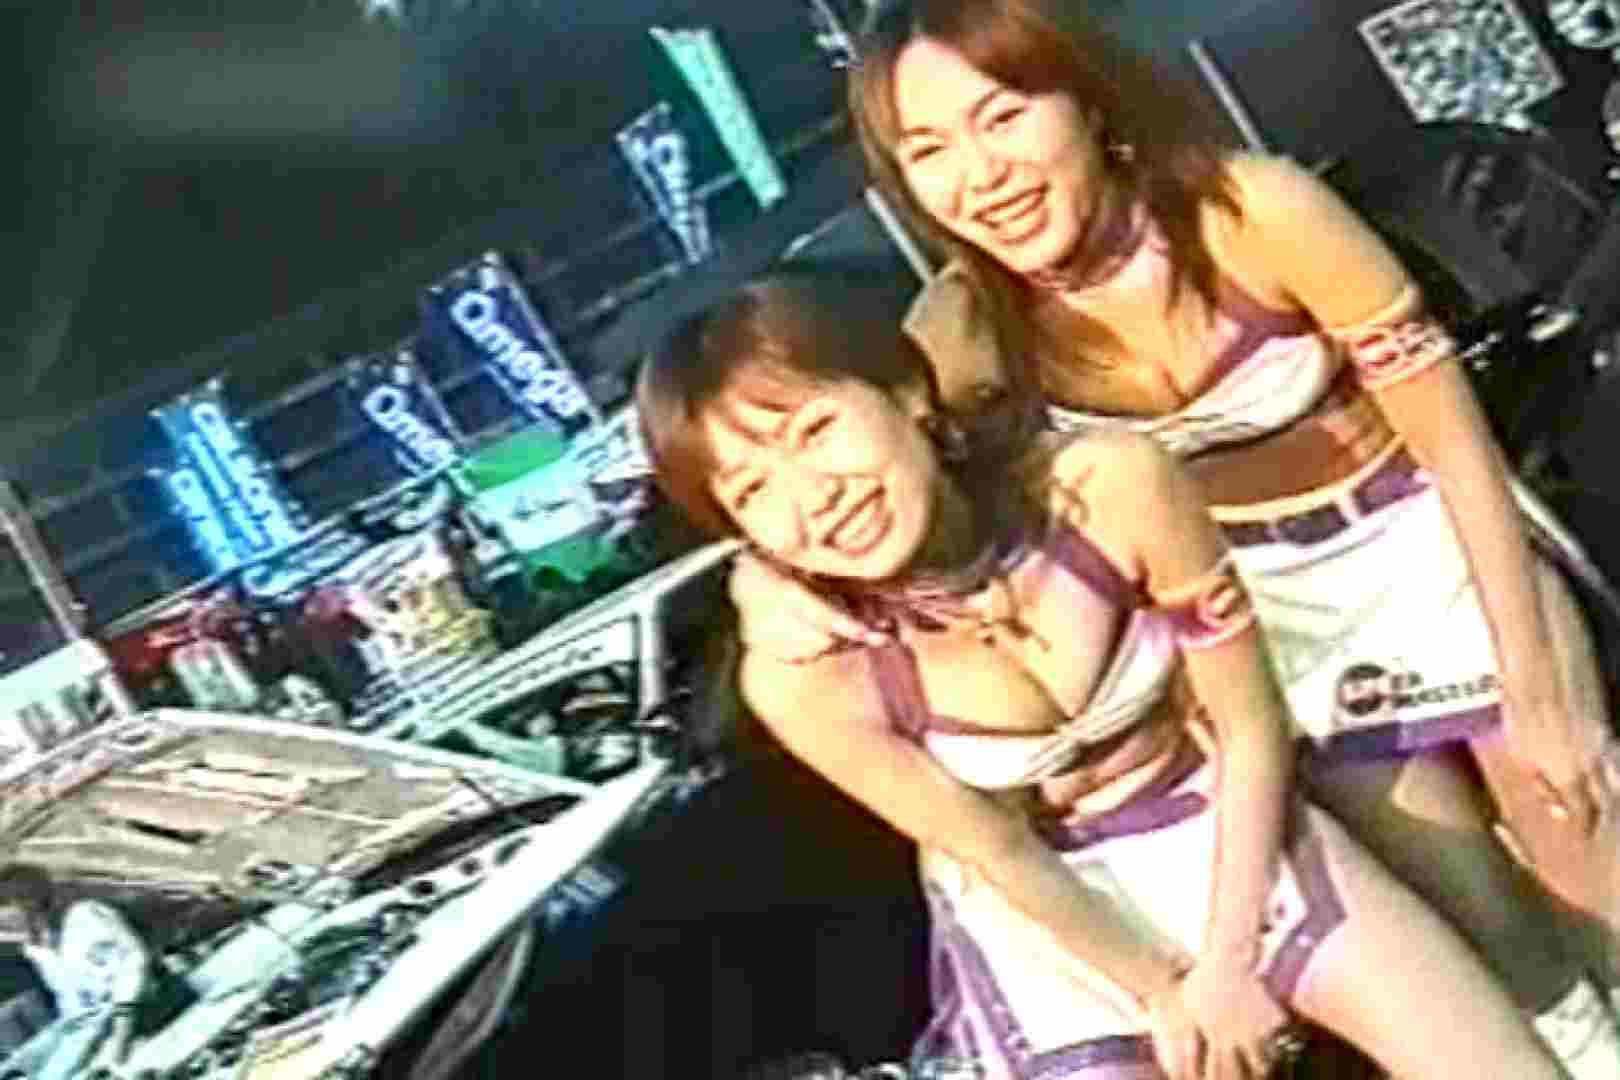 RQカメラ地獄Vol.23 卑猥 盗み撮り動画 106pic 18